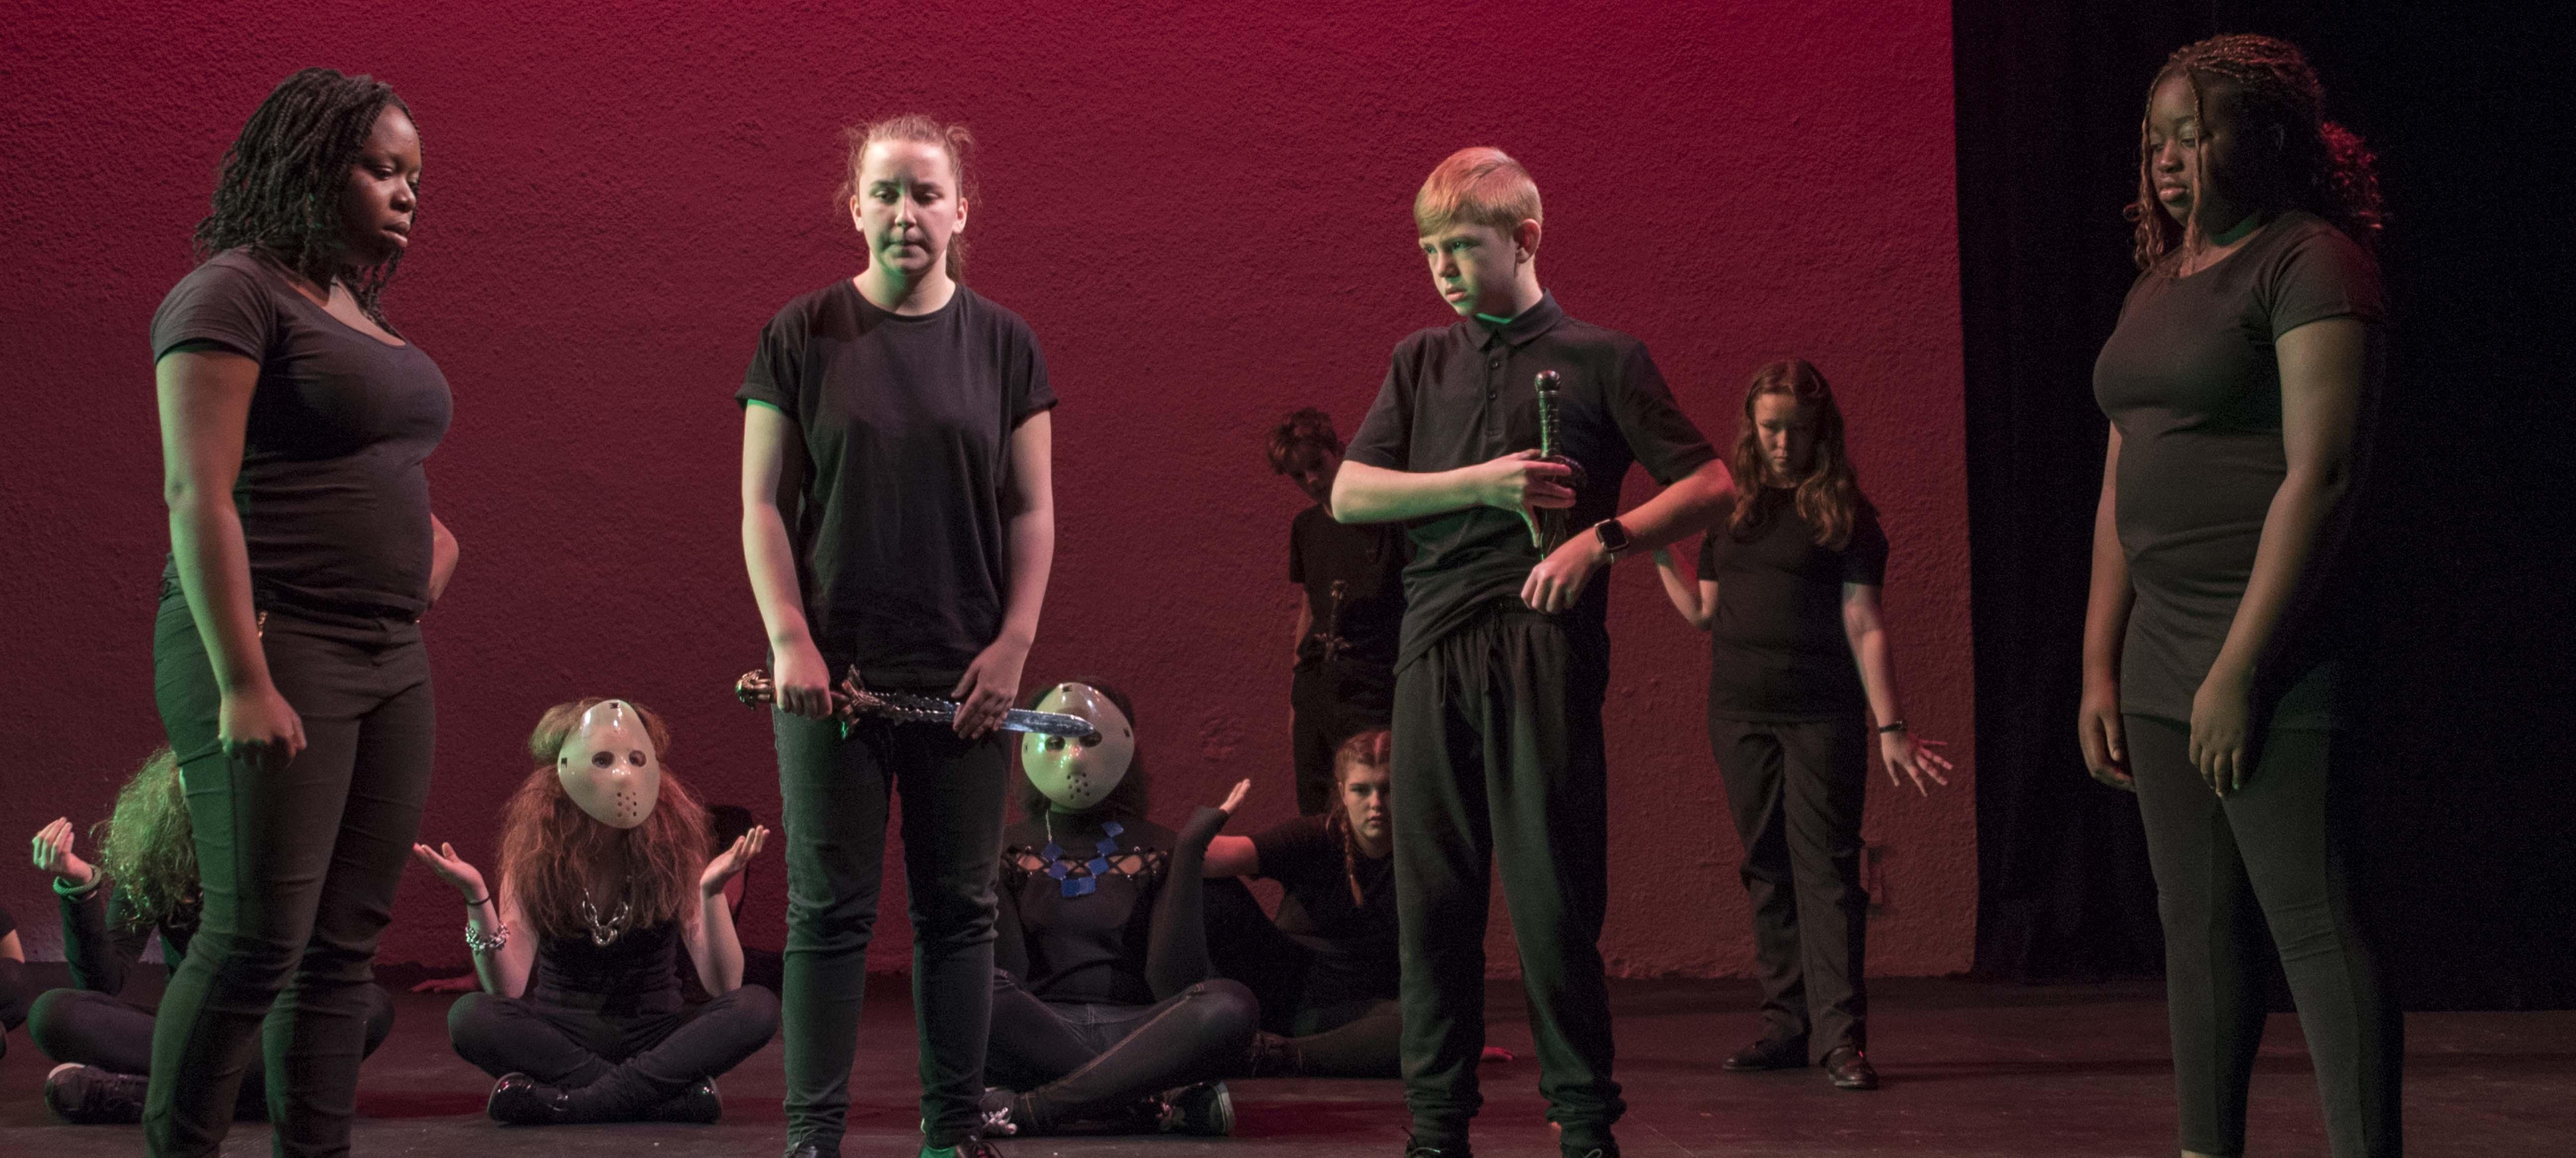 Macbeth (November 2016)